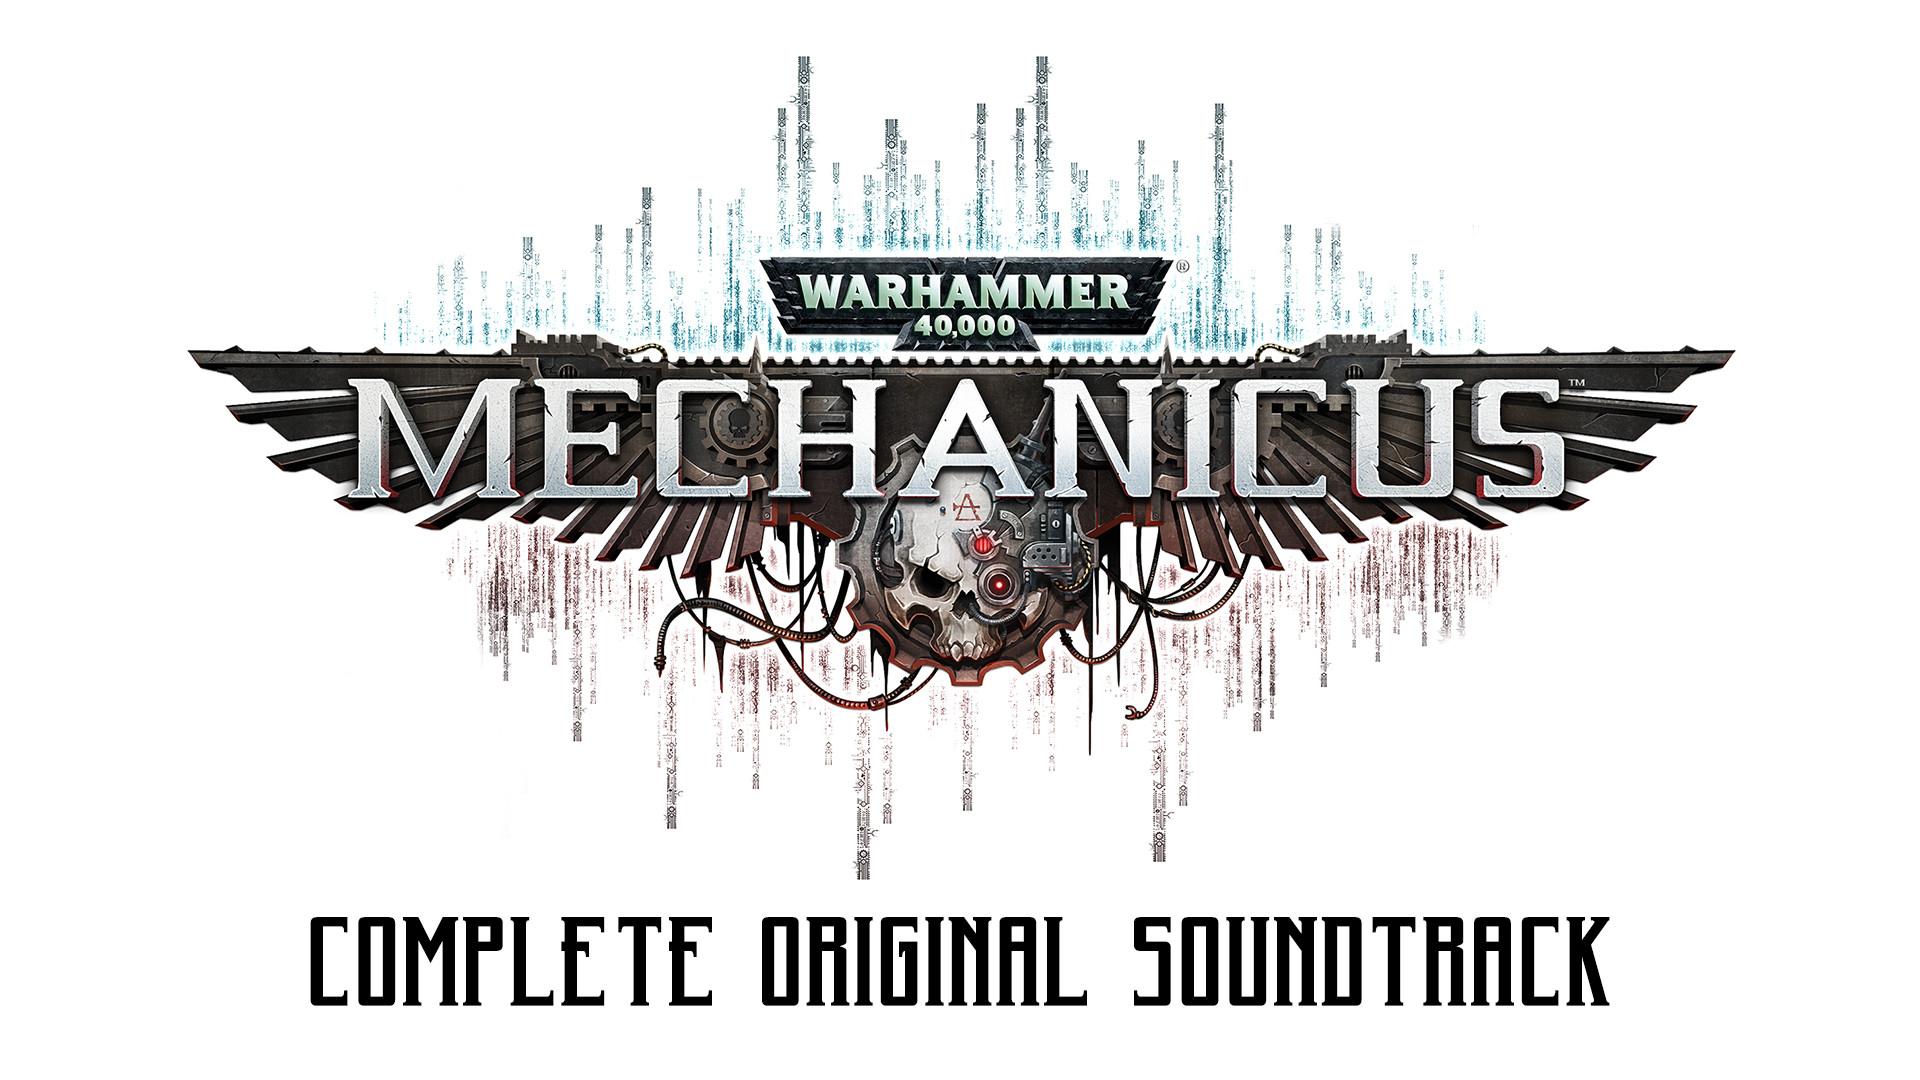 Warhammer 40,000: Mechanicus - Complete Original Soundtrack screenshot